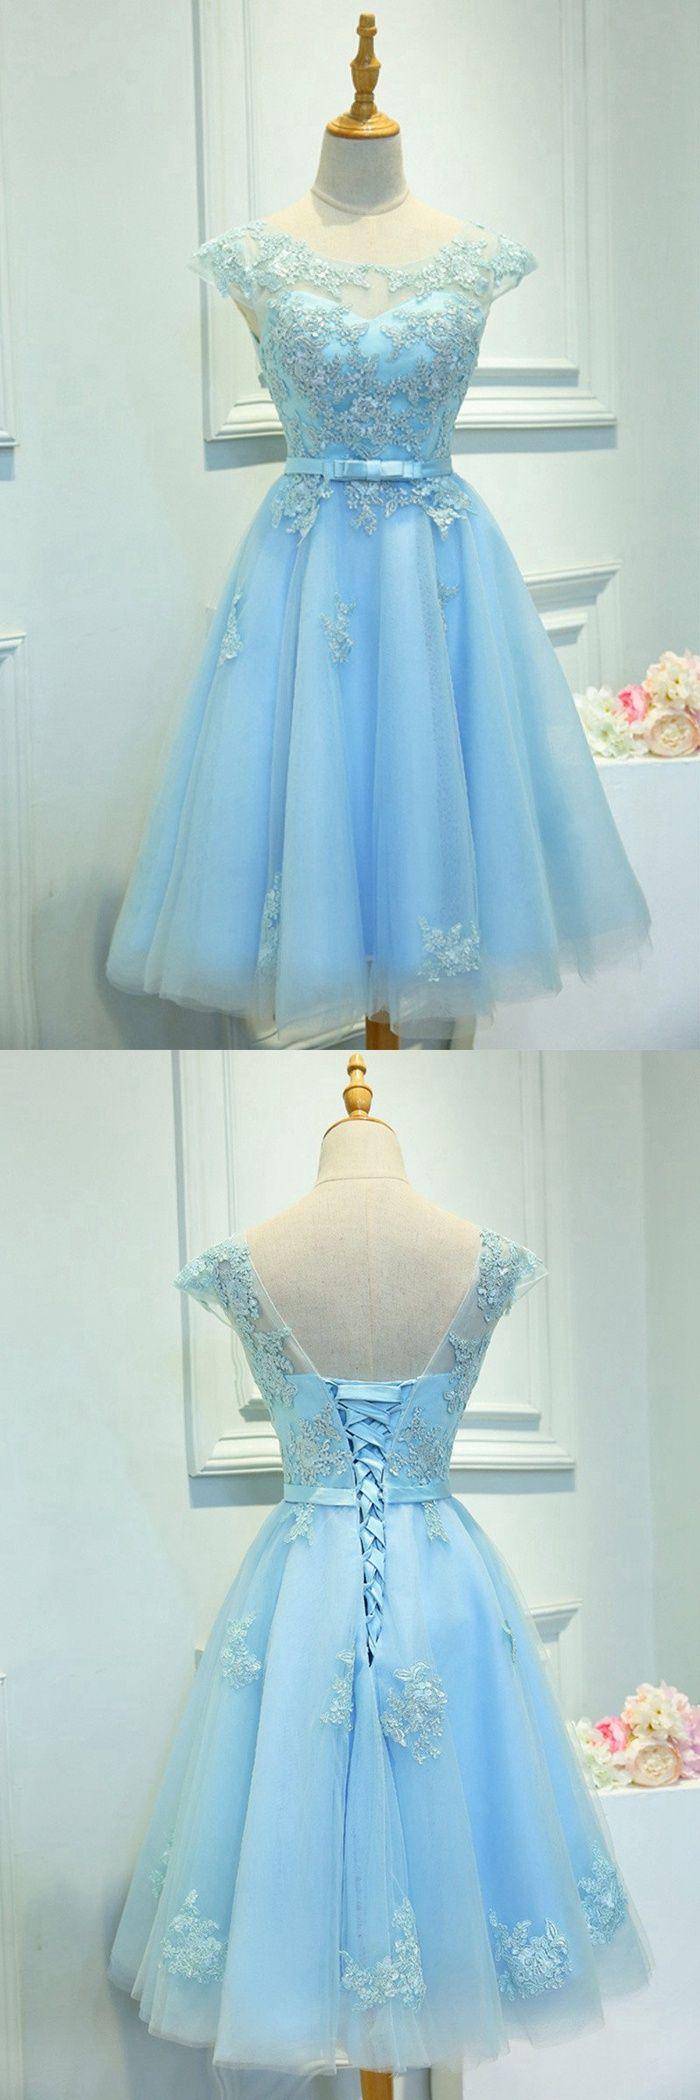 Sky Blue Homecoming Dress,Short Prom Dress,Back To School Dresses, Prom Dresses For Teens · BBTrending · Online Store Powered by Storenvy